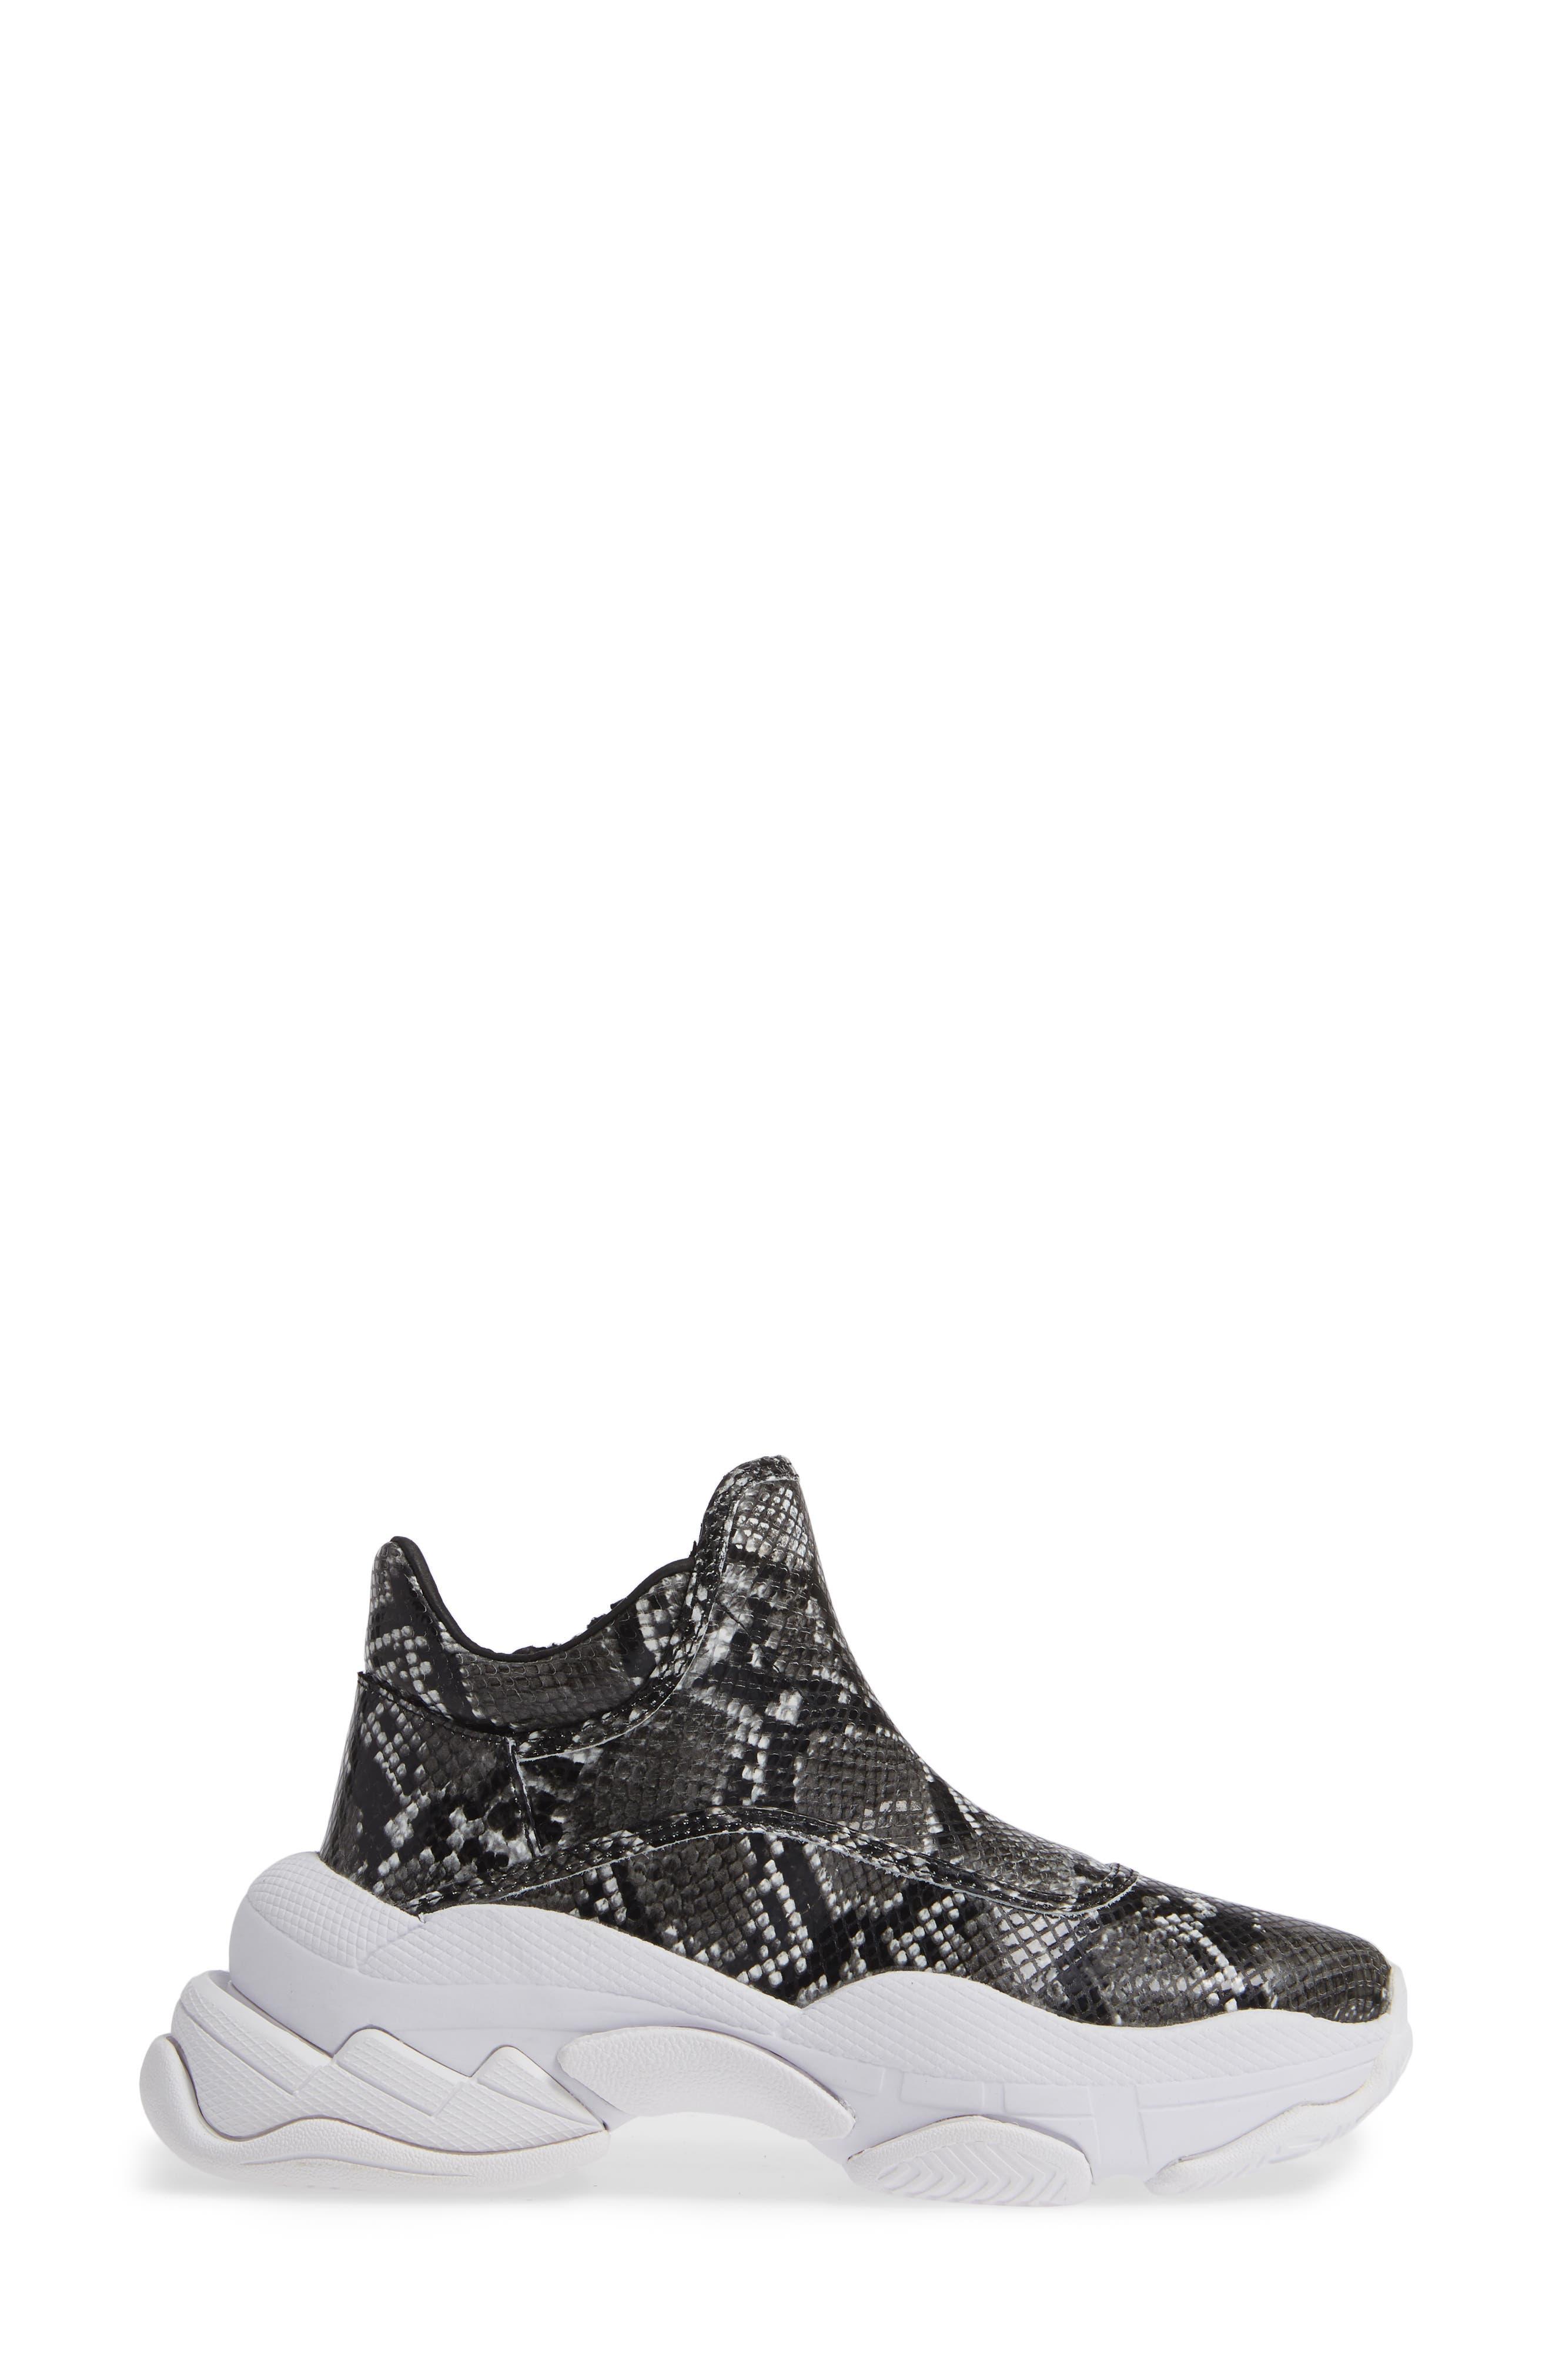 CTRL-DEL Sneaker,                             Alternate thumbnail 3, color,                             GREY BLACK SNAKE